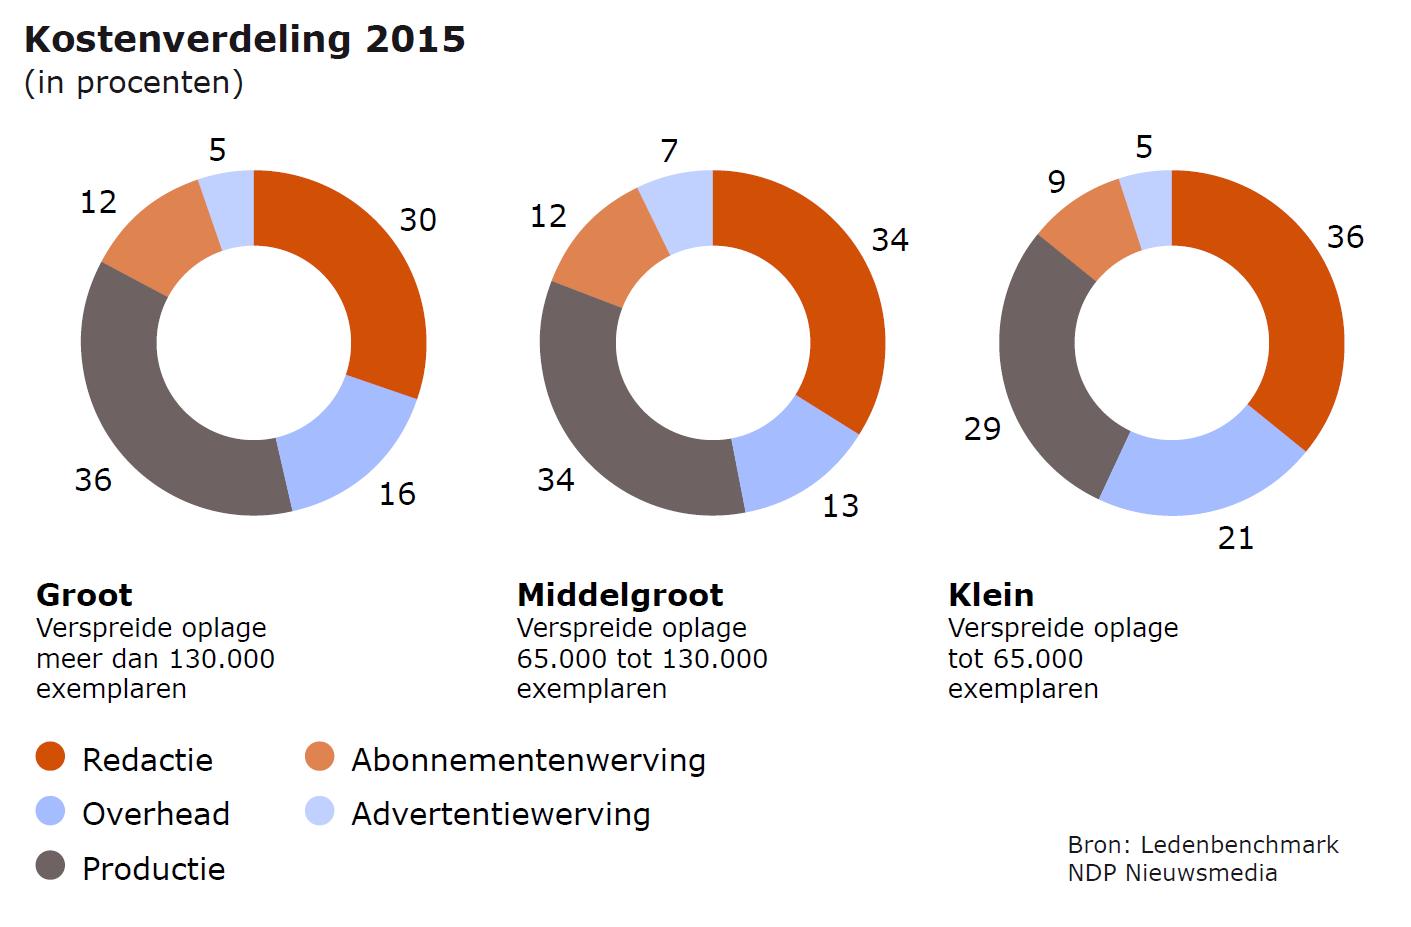 Kostenverdeling naar grootte dagblad 2015